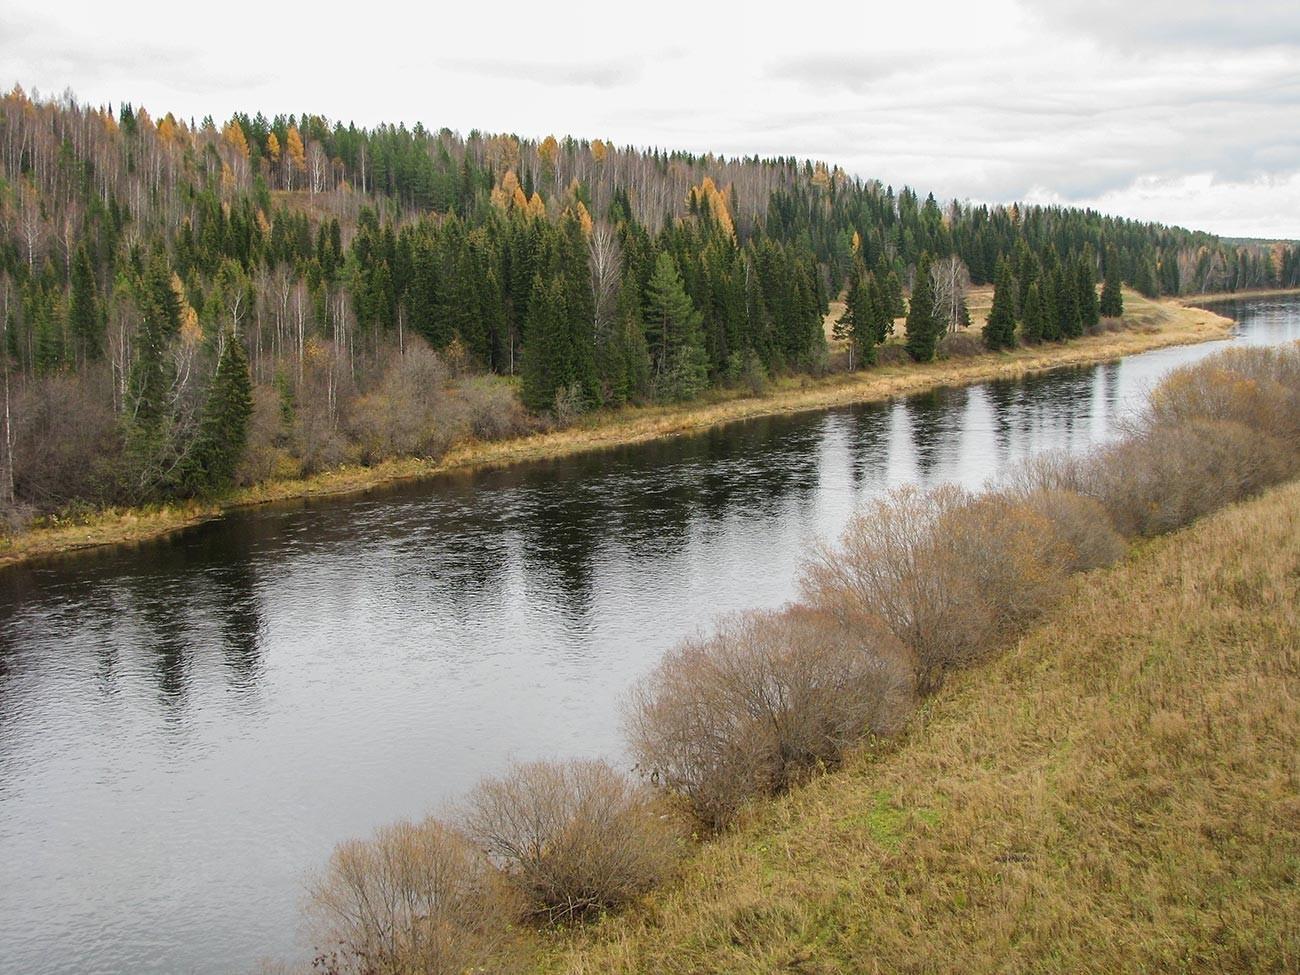 Rio Ukhta, onde foram descobertos depósitos de petróleo